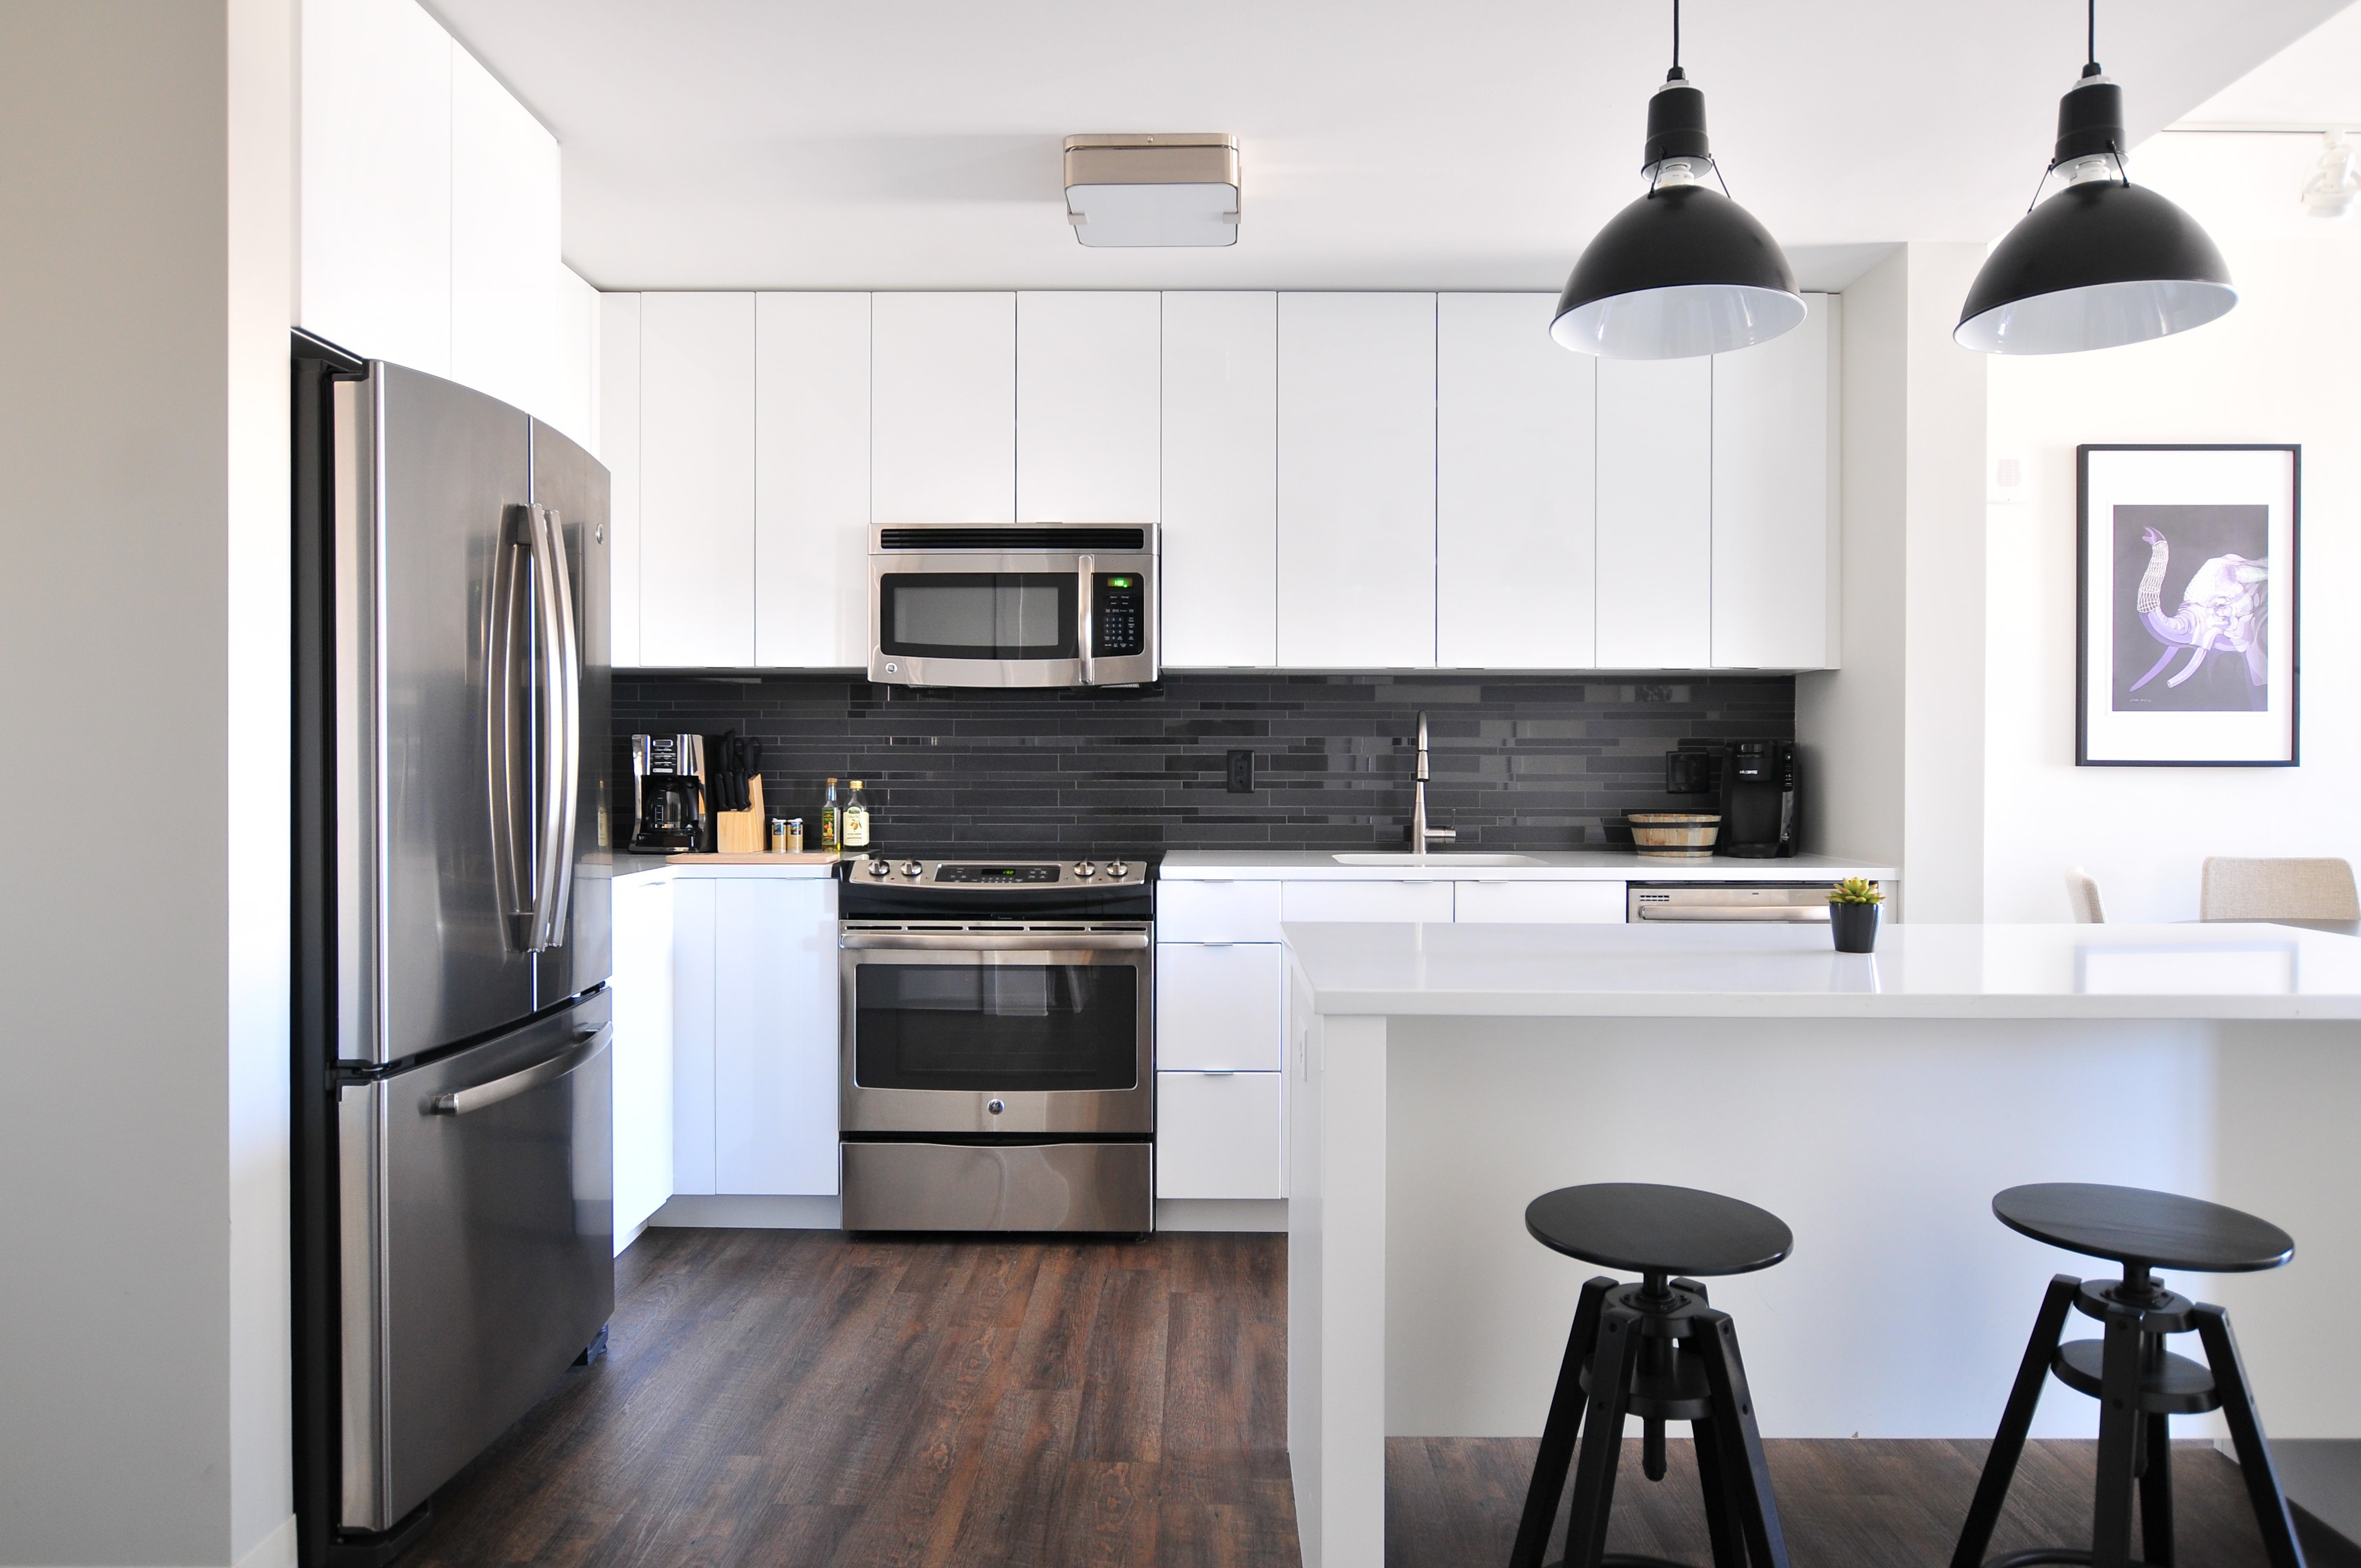 Better habits like having an organized home